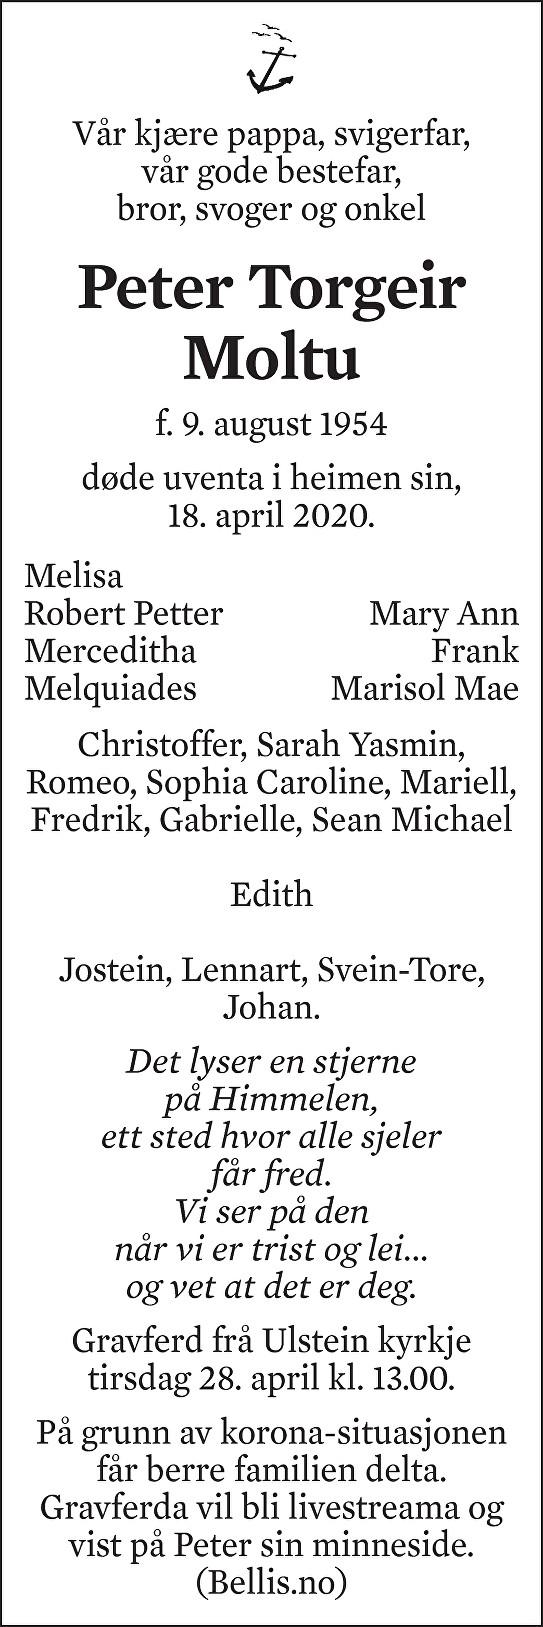 Peter Torgeir Moltu Dødsannonse